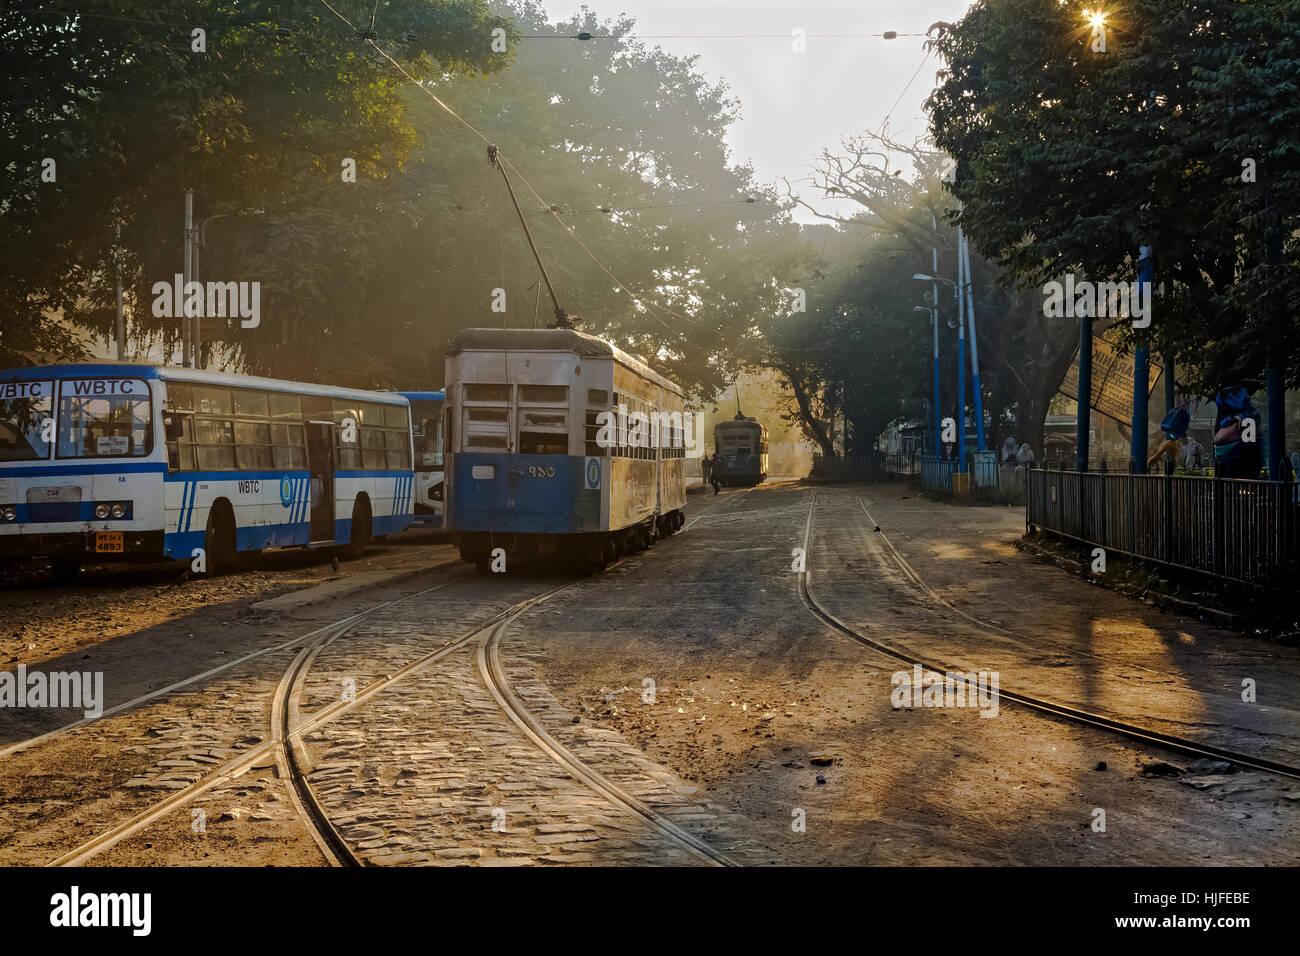 Heritage Kolkata tram standing on the track near a tramway depot at Esplanade, Kolkata on a foggy winter morning. - Stock Image